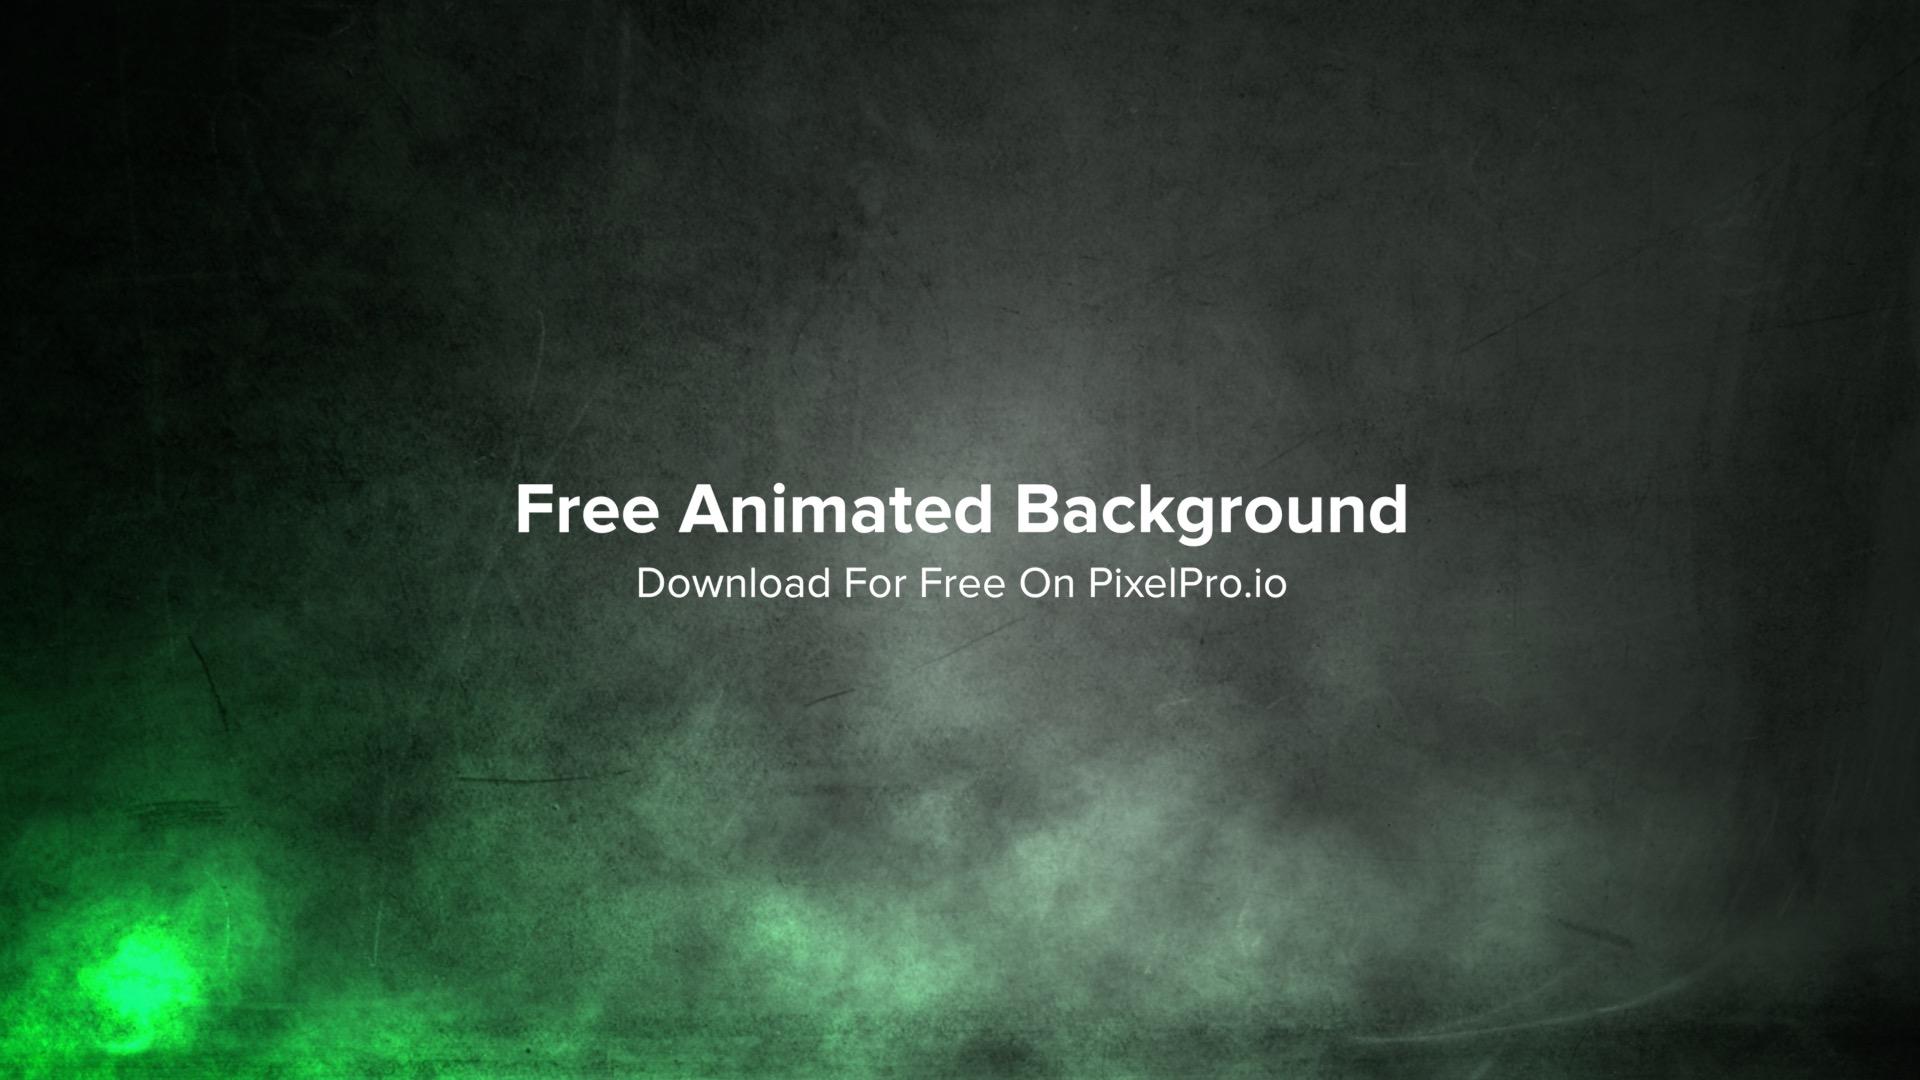 PixelPro Animated Background 3.jpg